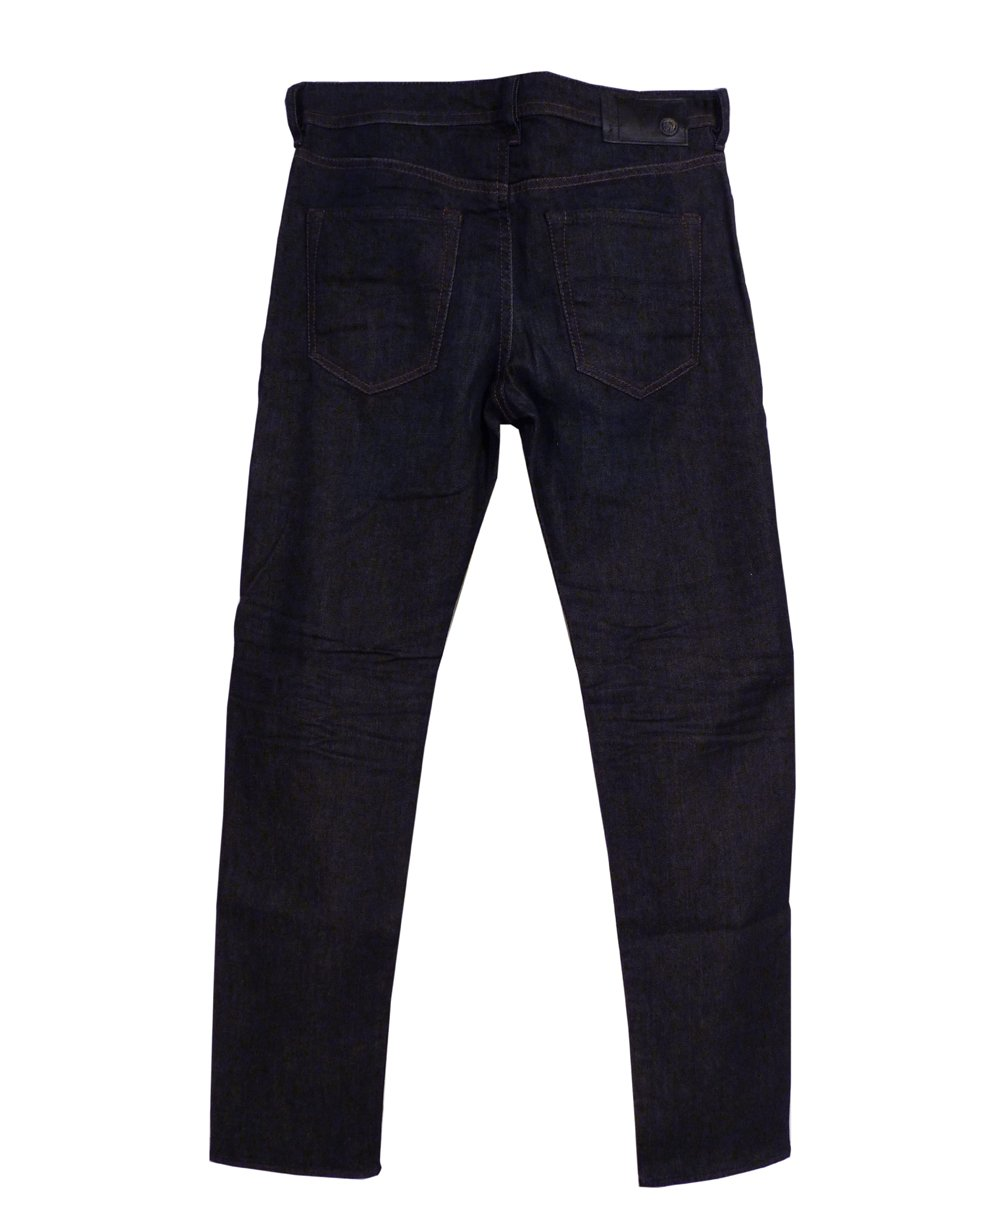 diesel dark wash buster 0845g stretch regular slim tapered jeans diesel from jonathan trumbull uk. Black Bedroom Furniture Sets. Home Design Ideas